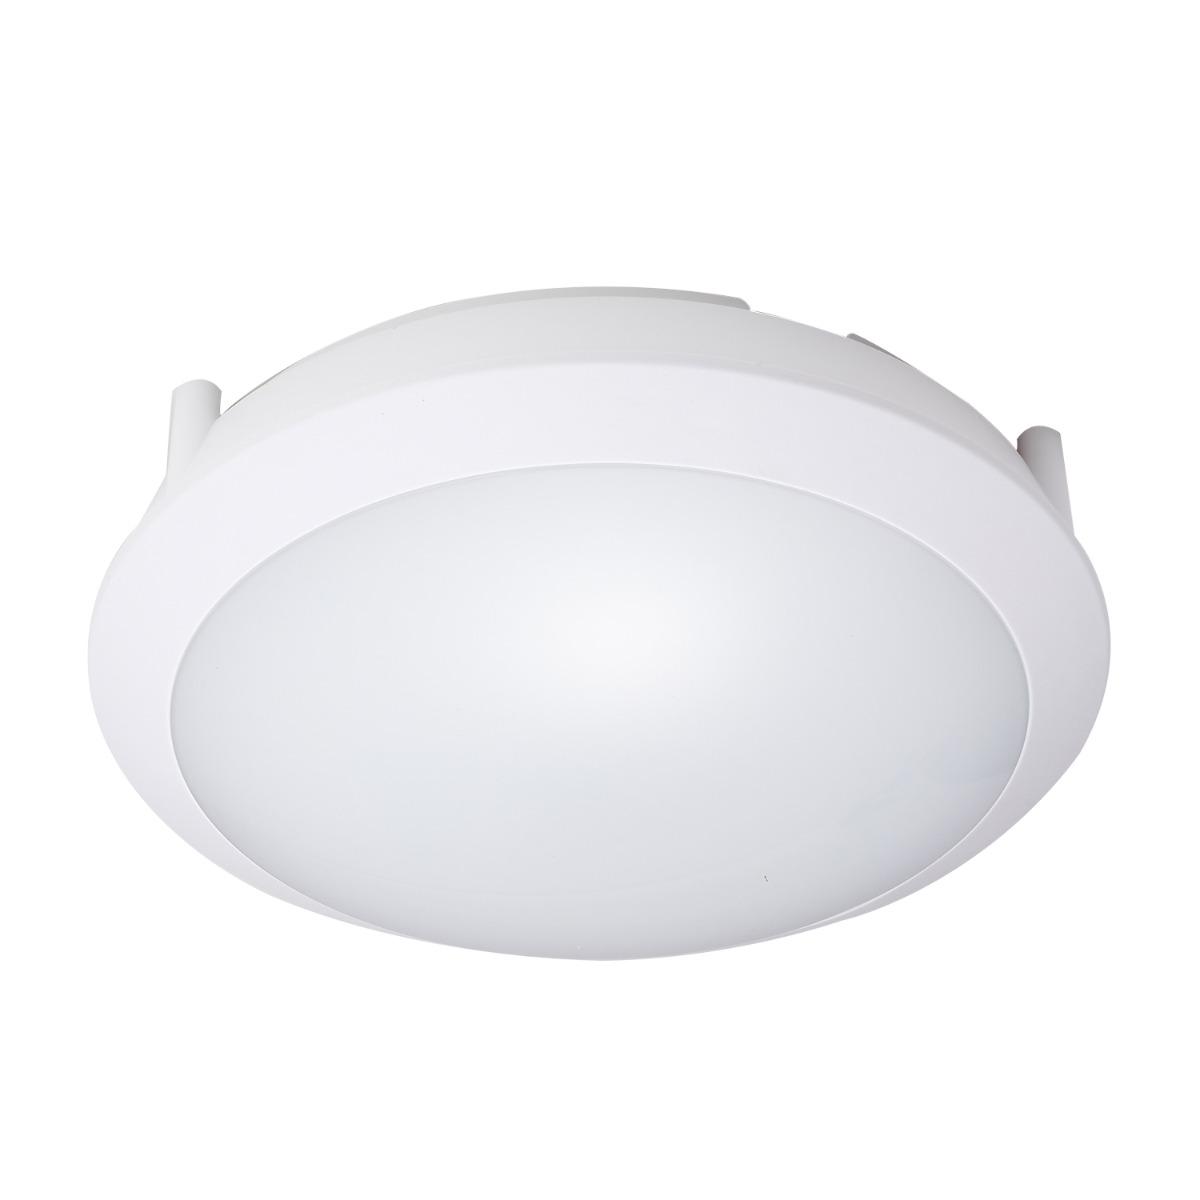 Noxion LED Bulkhead Pro 20W 2700K/3000K/4000K Tunable White   2000lm - Corridor Sensor - Emergency Unit 3H - Replacer for 2x26W